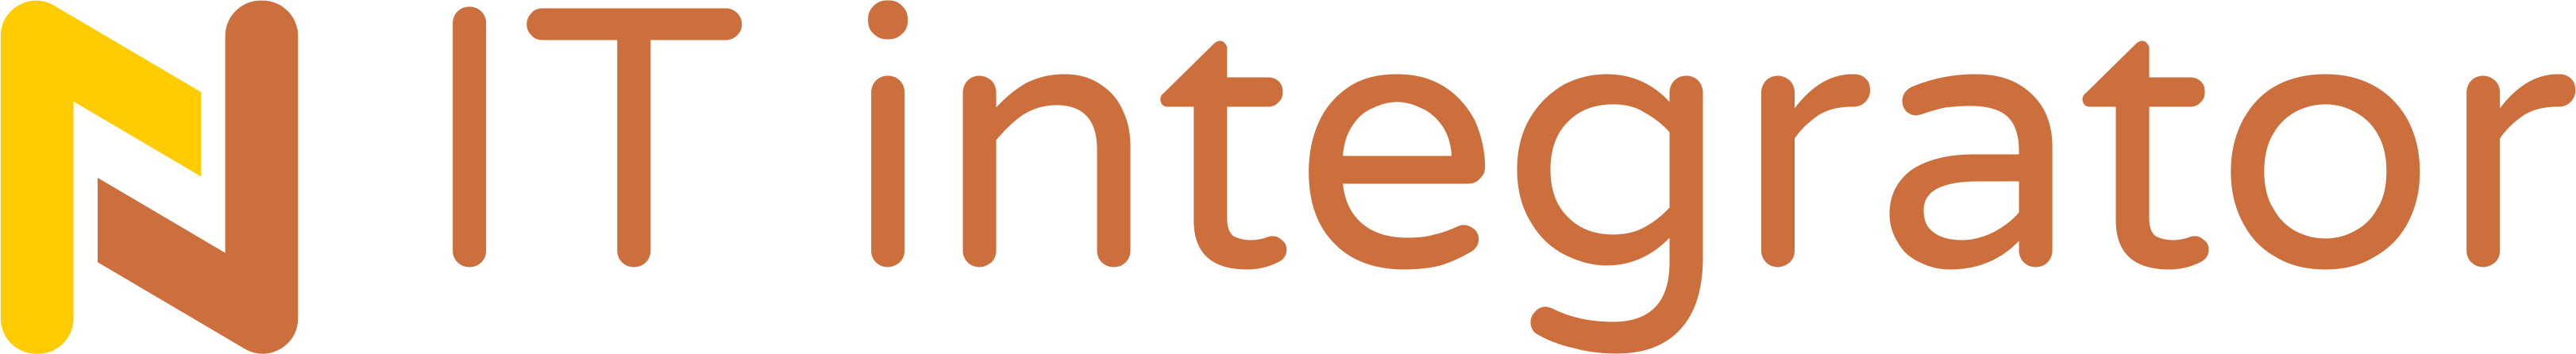 Логотип для IT интегратора фото f_90661495572a529f.png